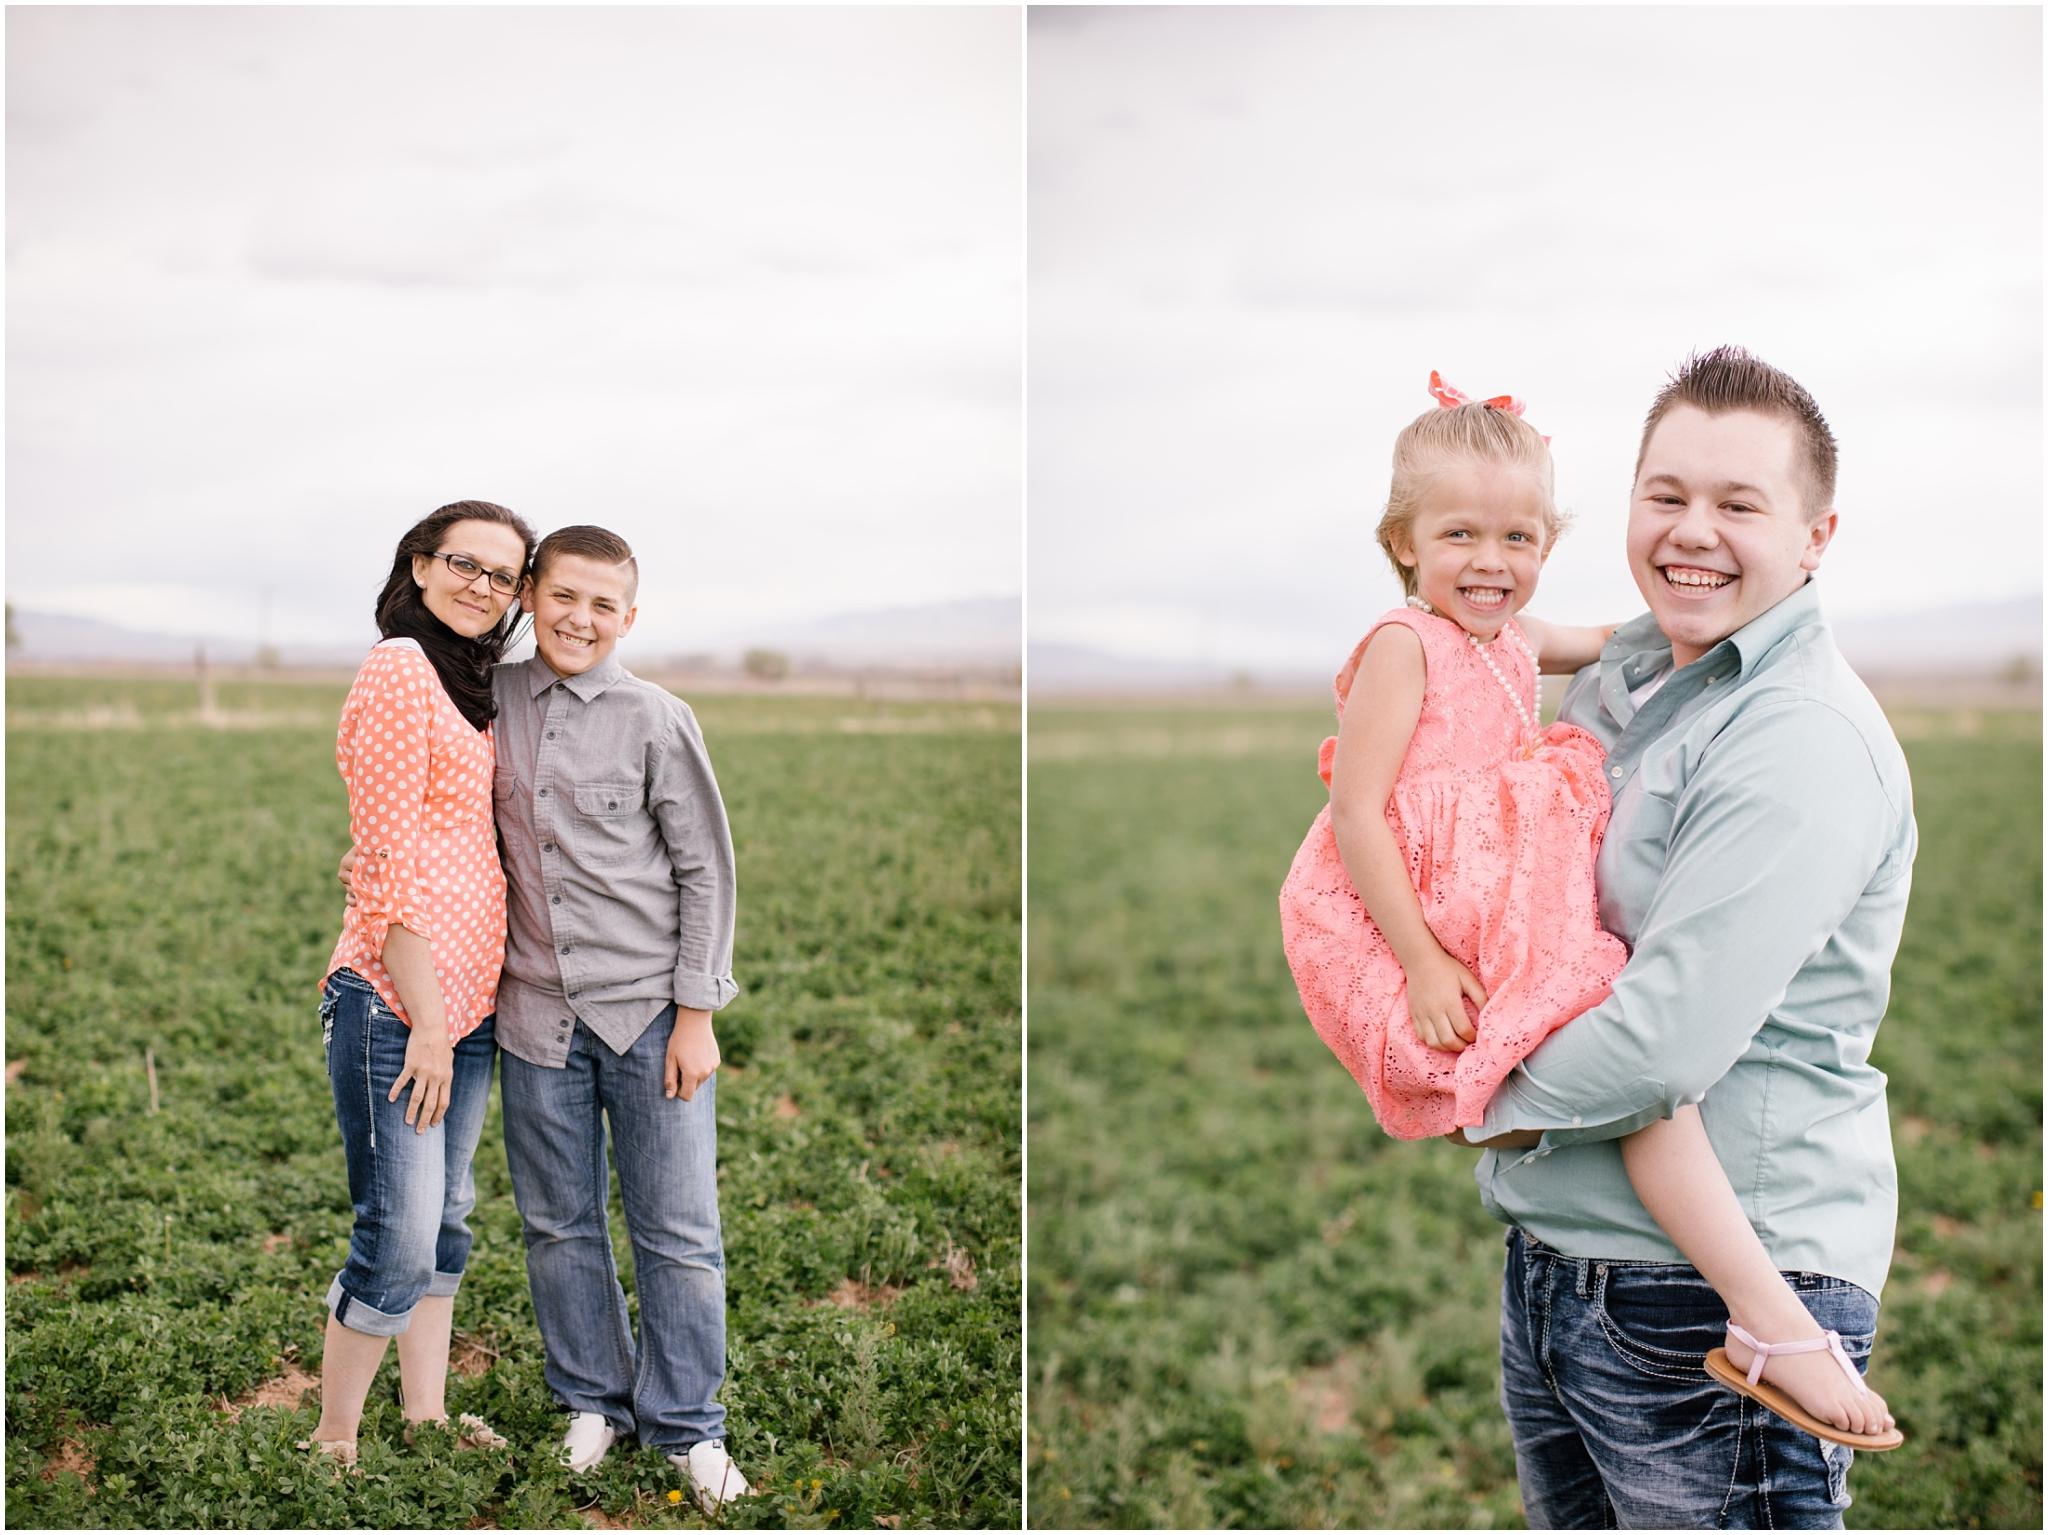 Conner-70_Lizzie-B-Imagery-Utah-Family-Photographer-Salt-Lake-City-Park-City-Utah-County.jpg